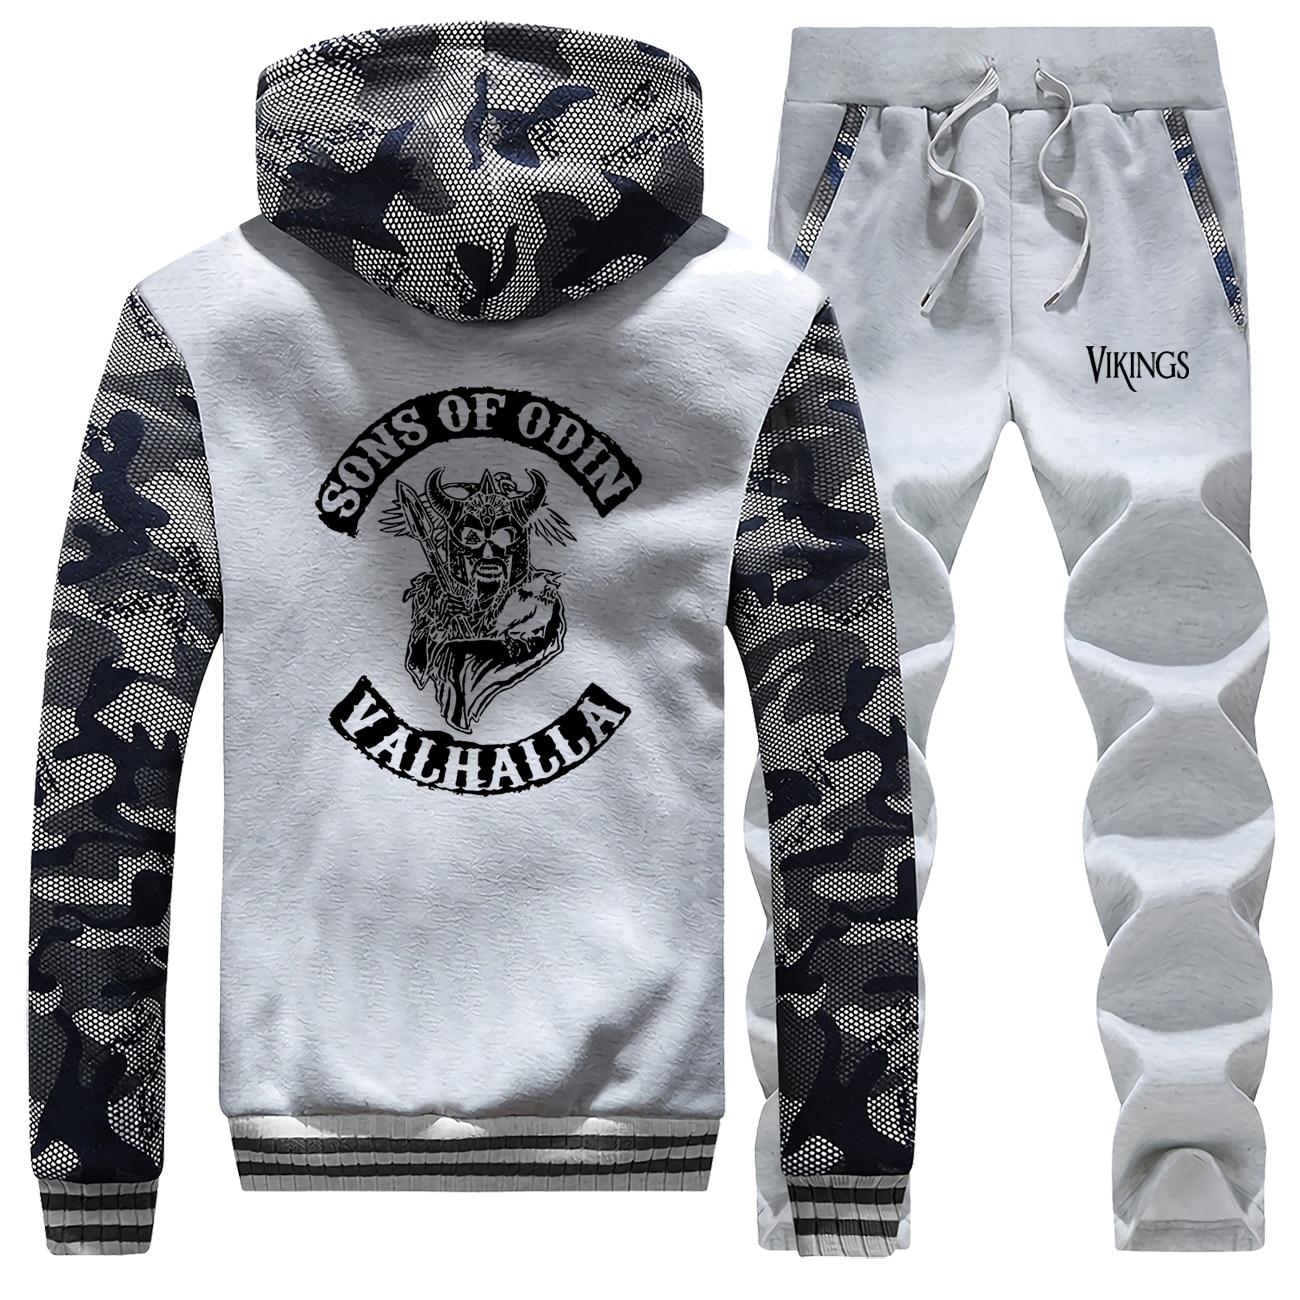 Sons Of Odin Camo Mam Set TV Show Vikings Sportsman Wear Valhalla Hoodies Winter Casual Hoodies Fleece Men's Sets Fashion Jacket